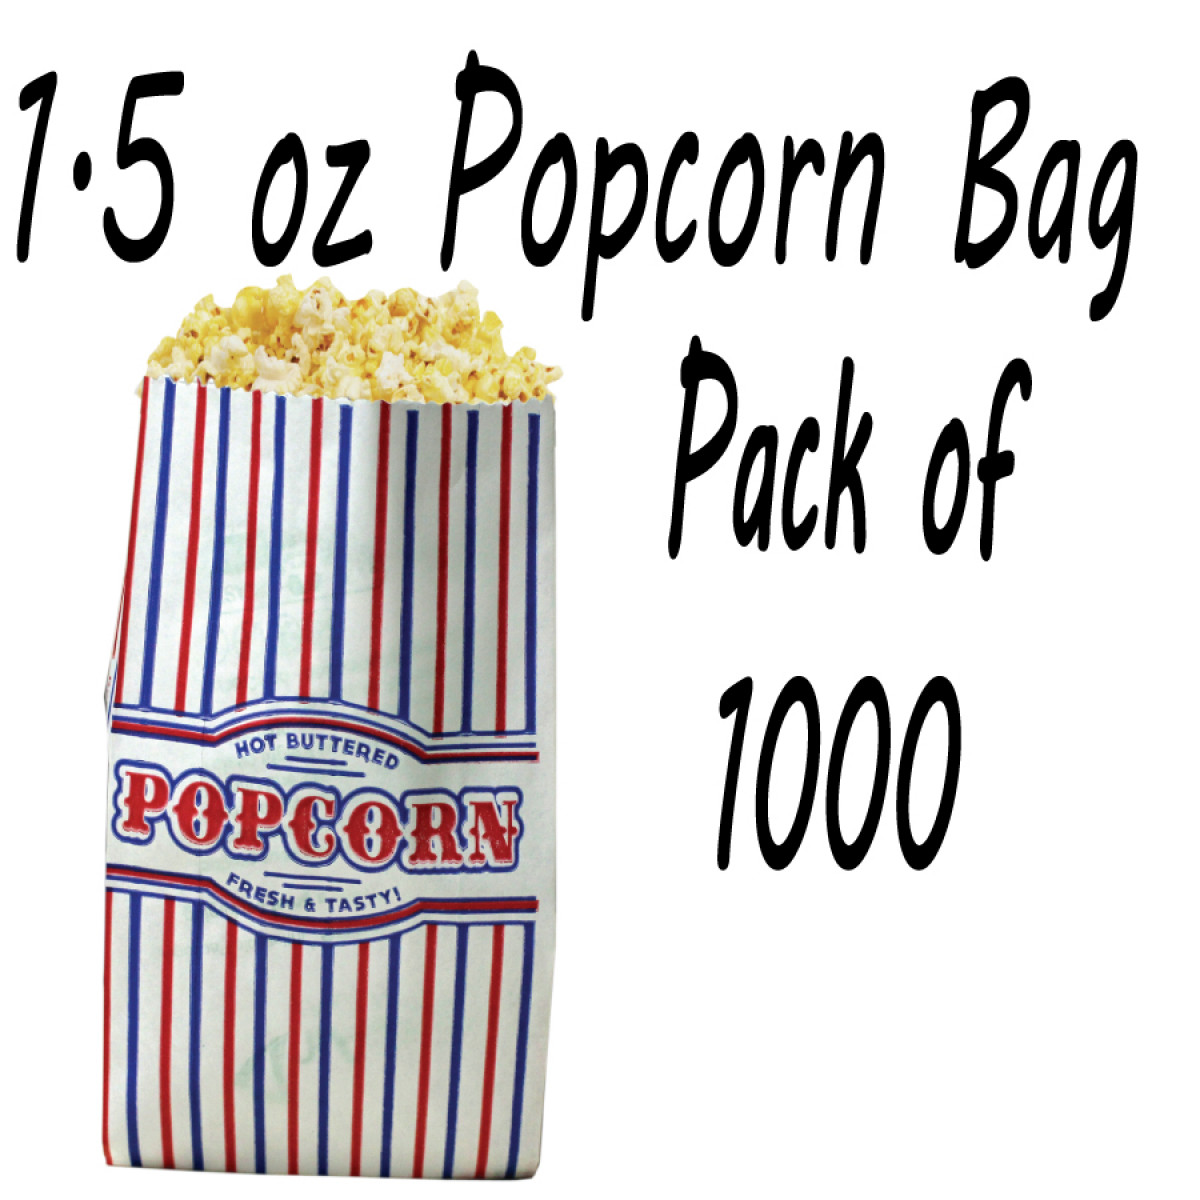 Popcorn Bags Popcorn Supplies